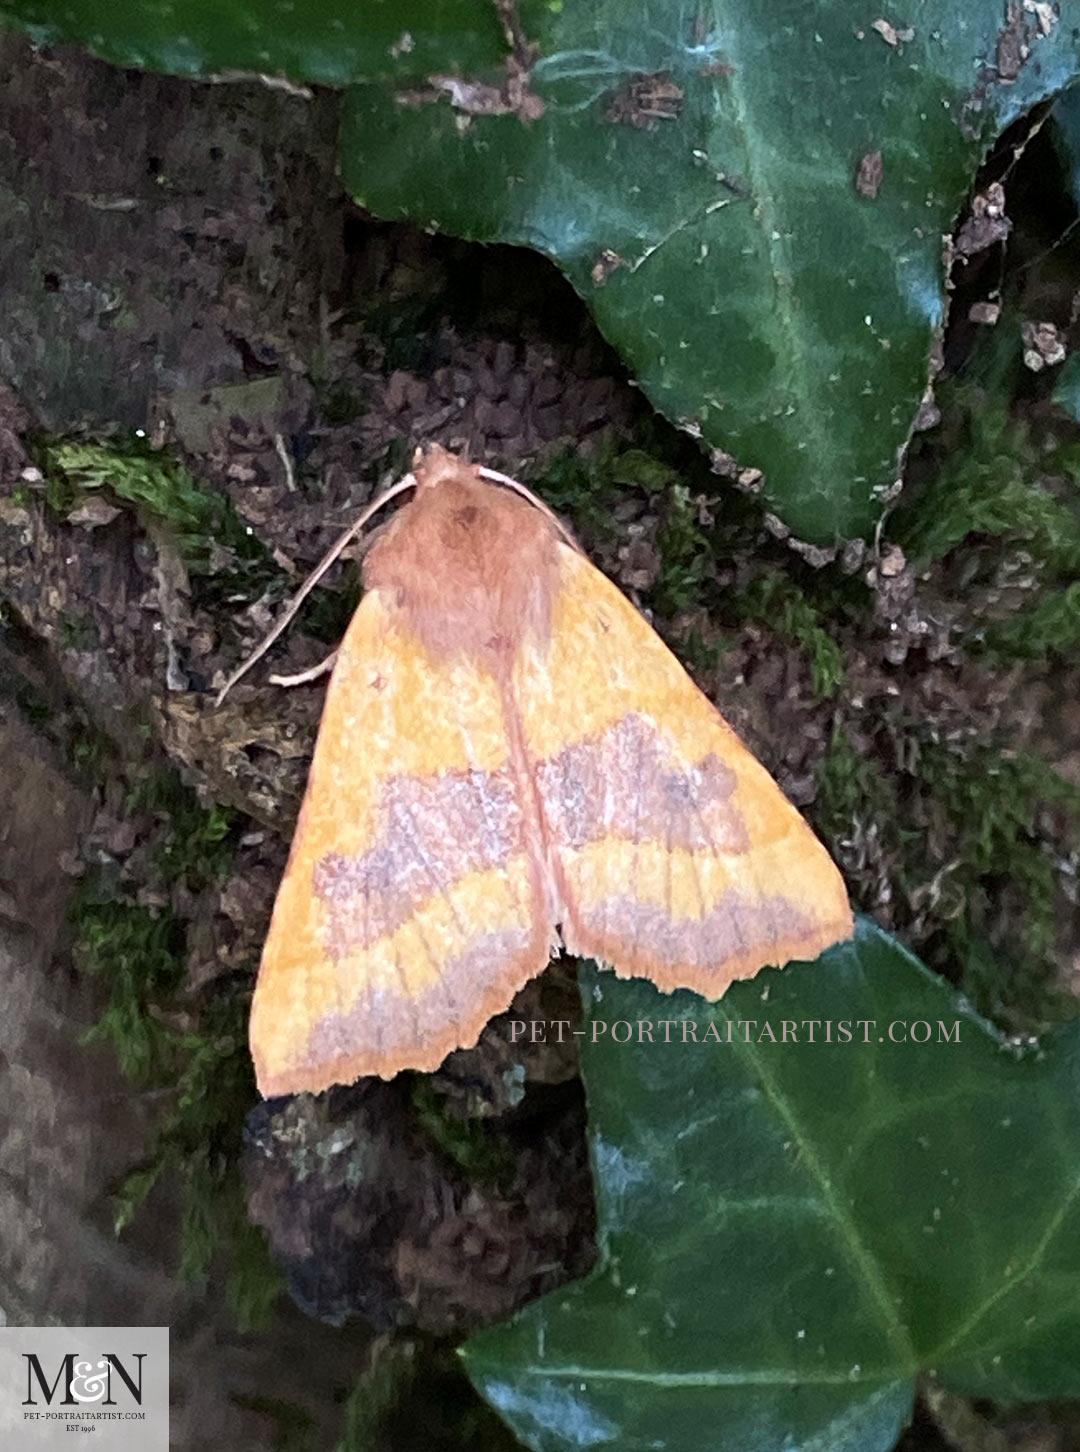 Melanie's August Monthly News moth